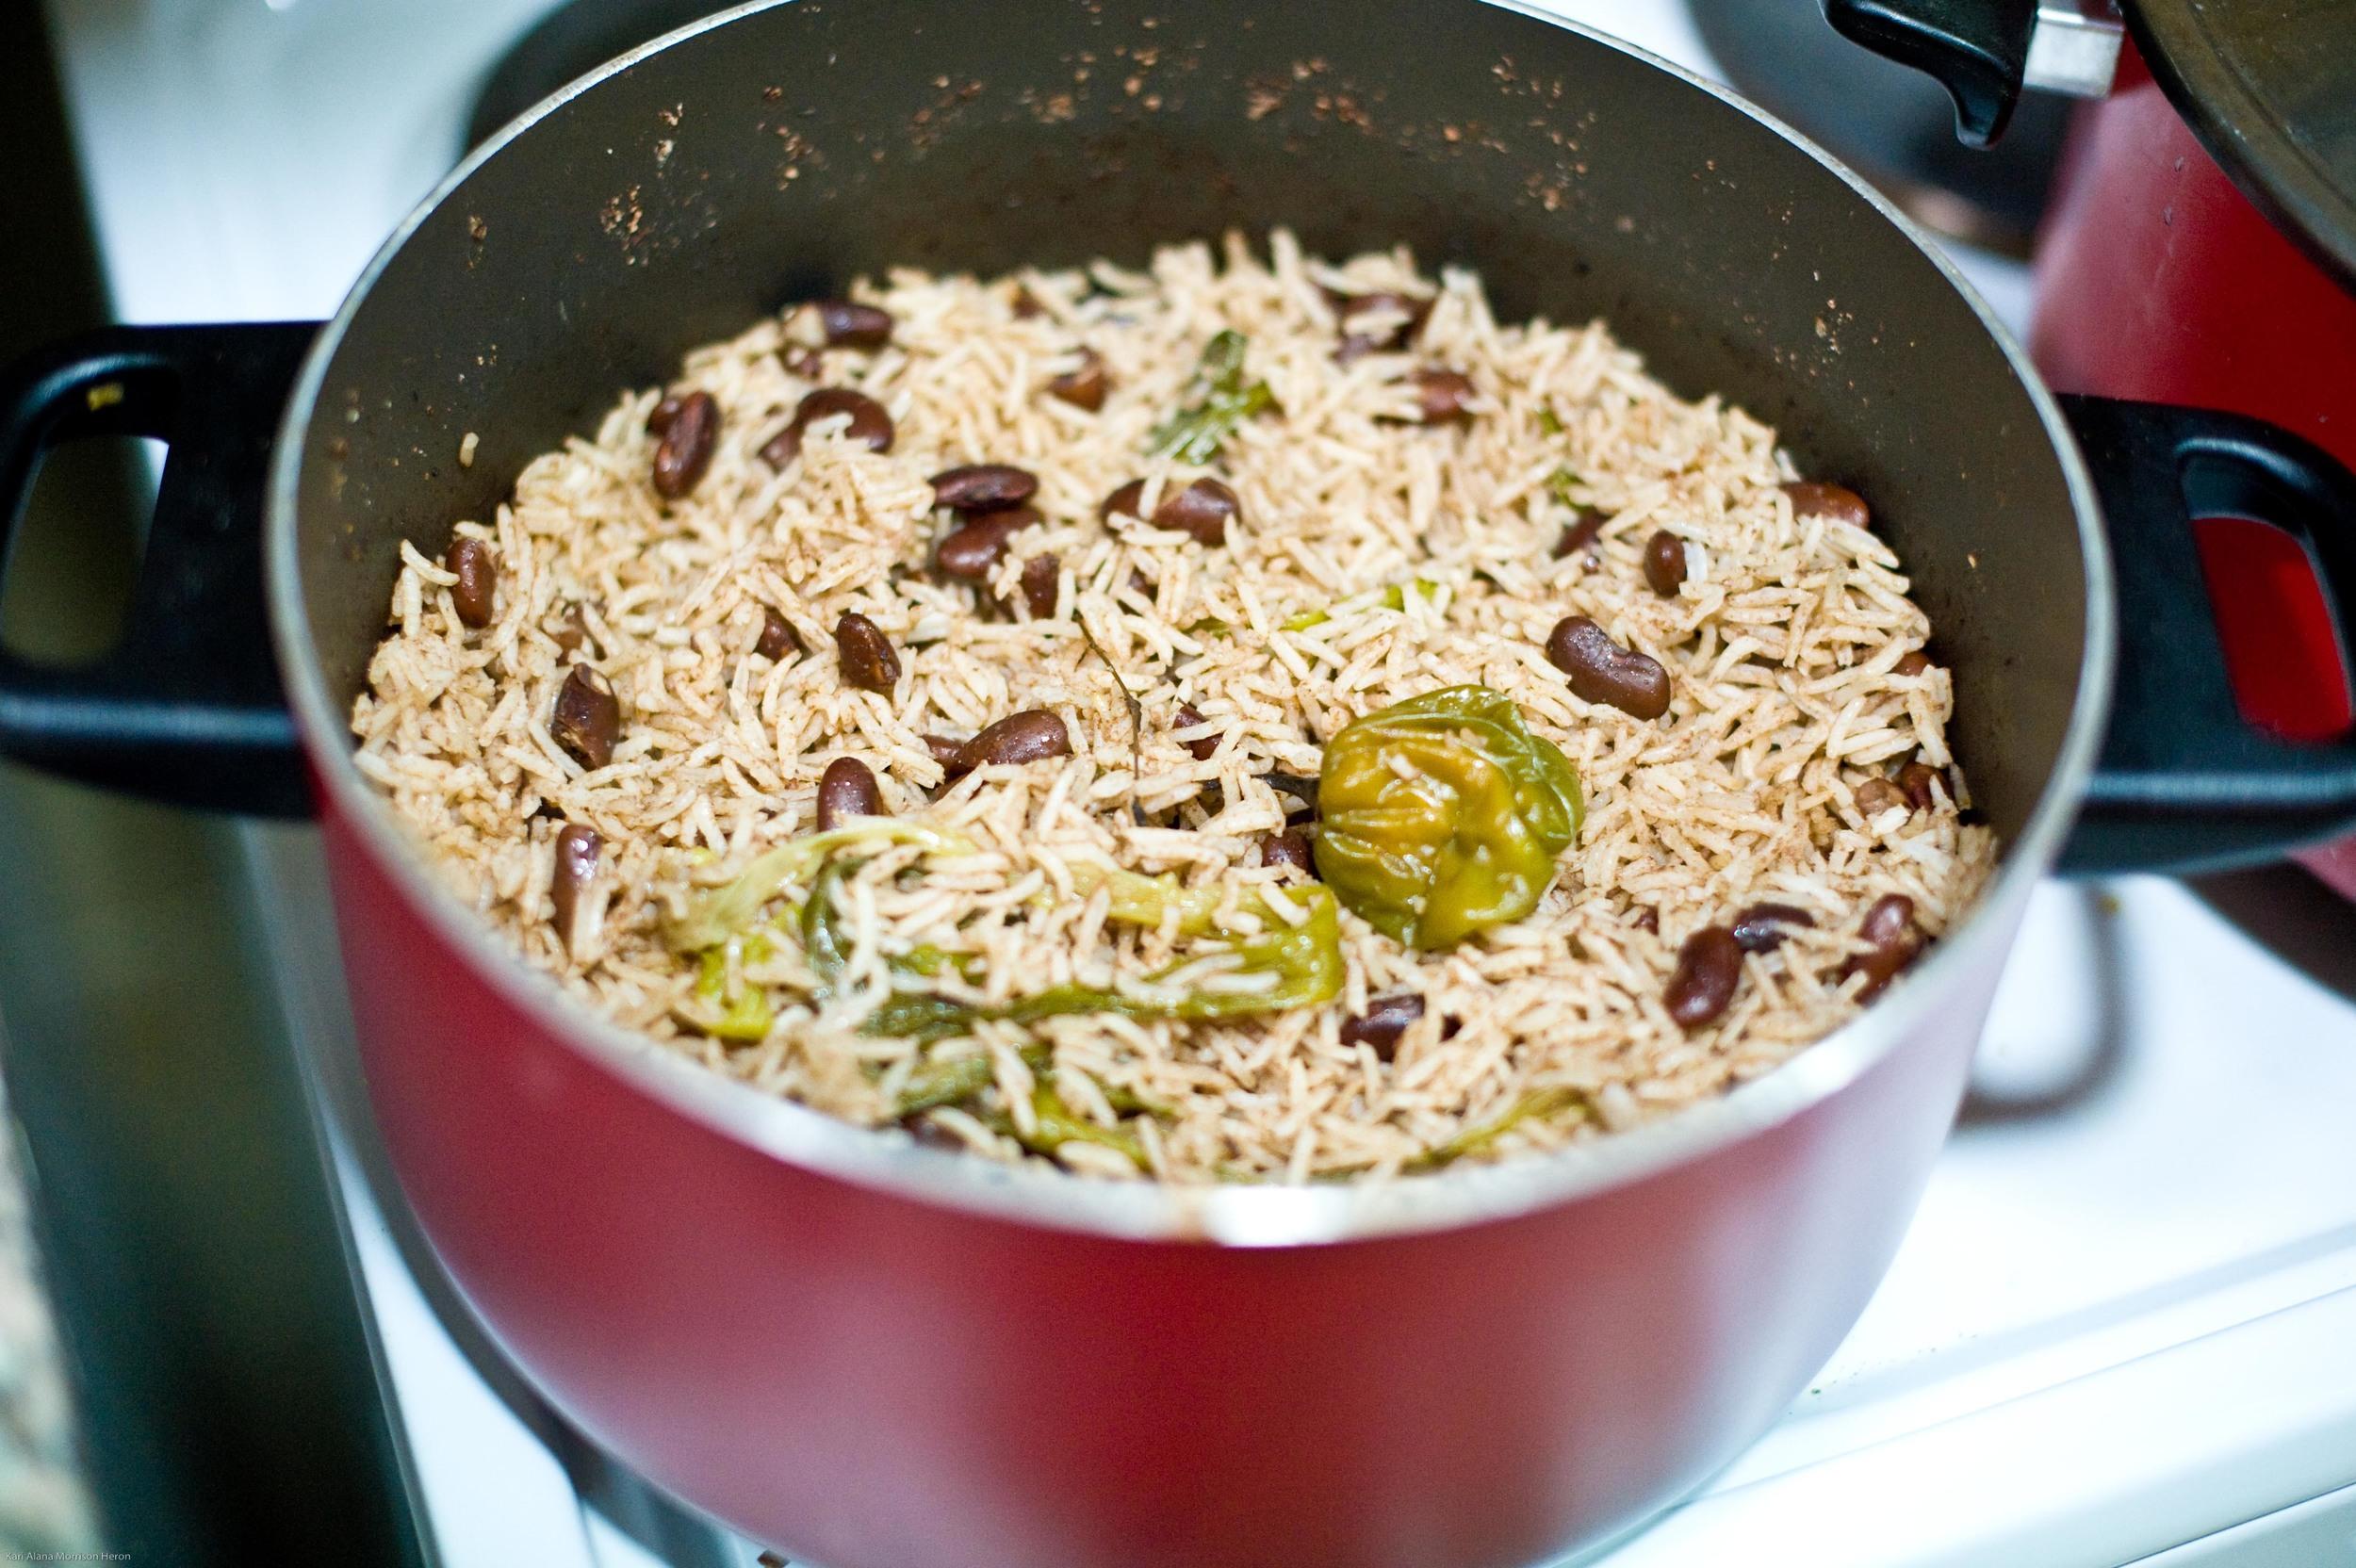 jamaican-rice-and-peas-13.jpg